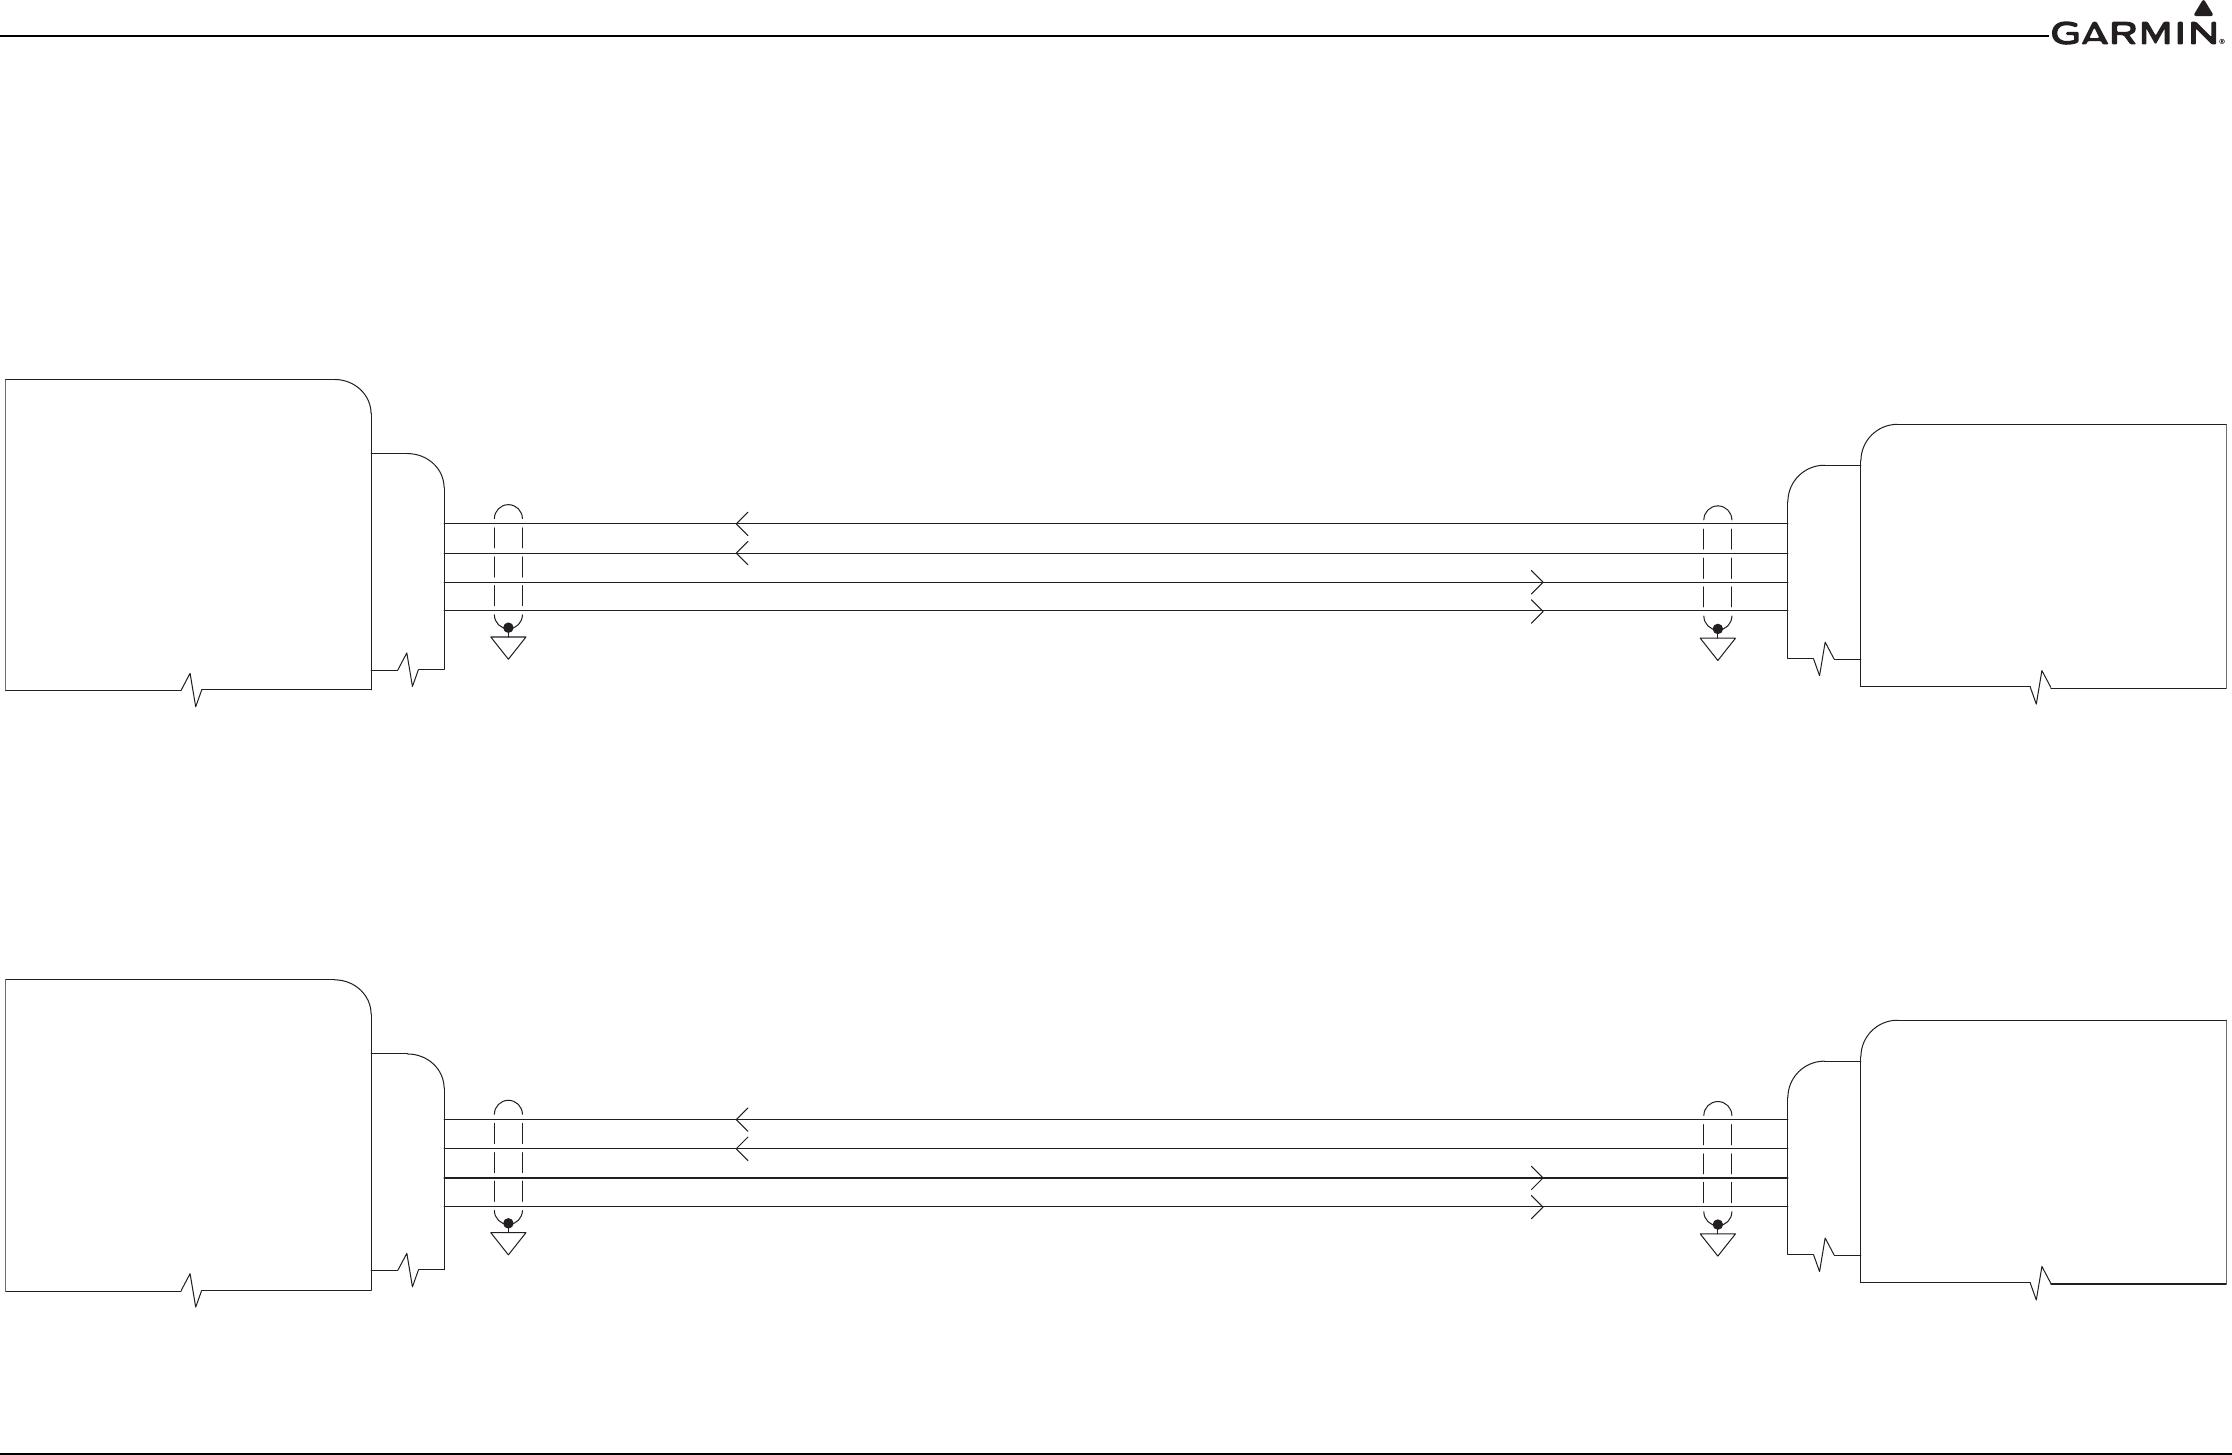 Garmin 0181200 Licensed Non Broadcast Aeronautical Transmitter User Gsd 20 Wiring Diagram 190 01277 00 Gra 5500 Installation Manual